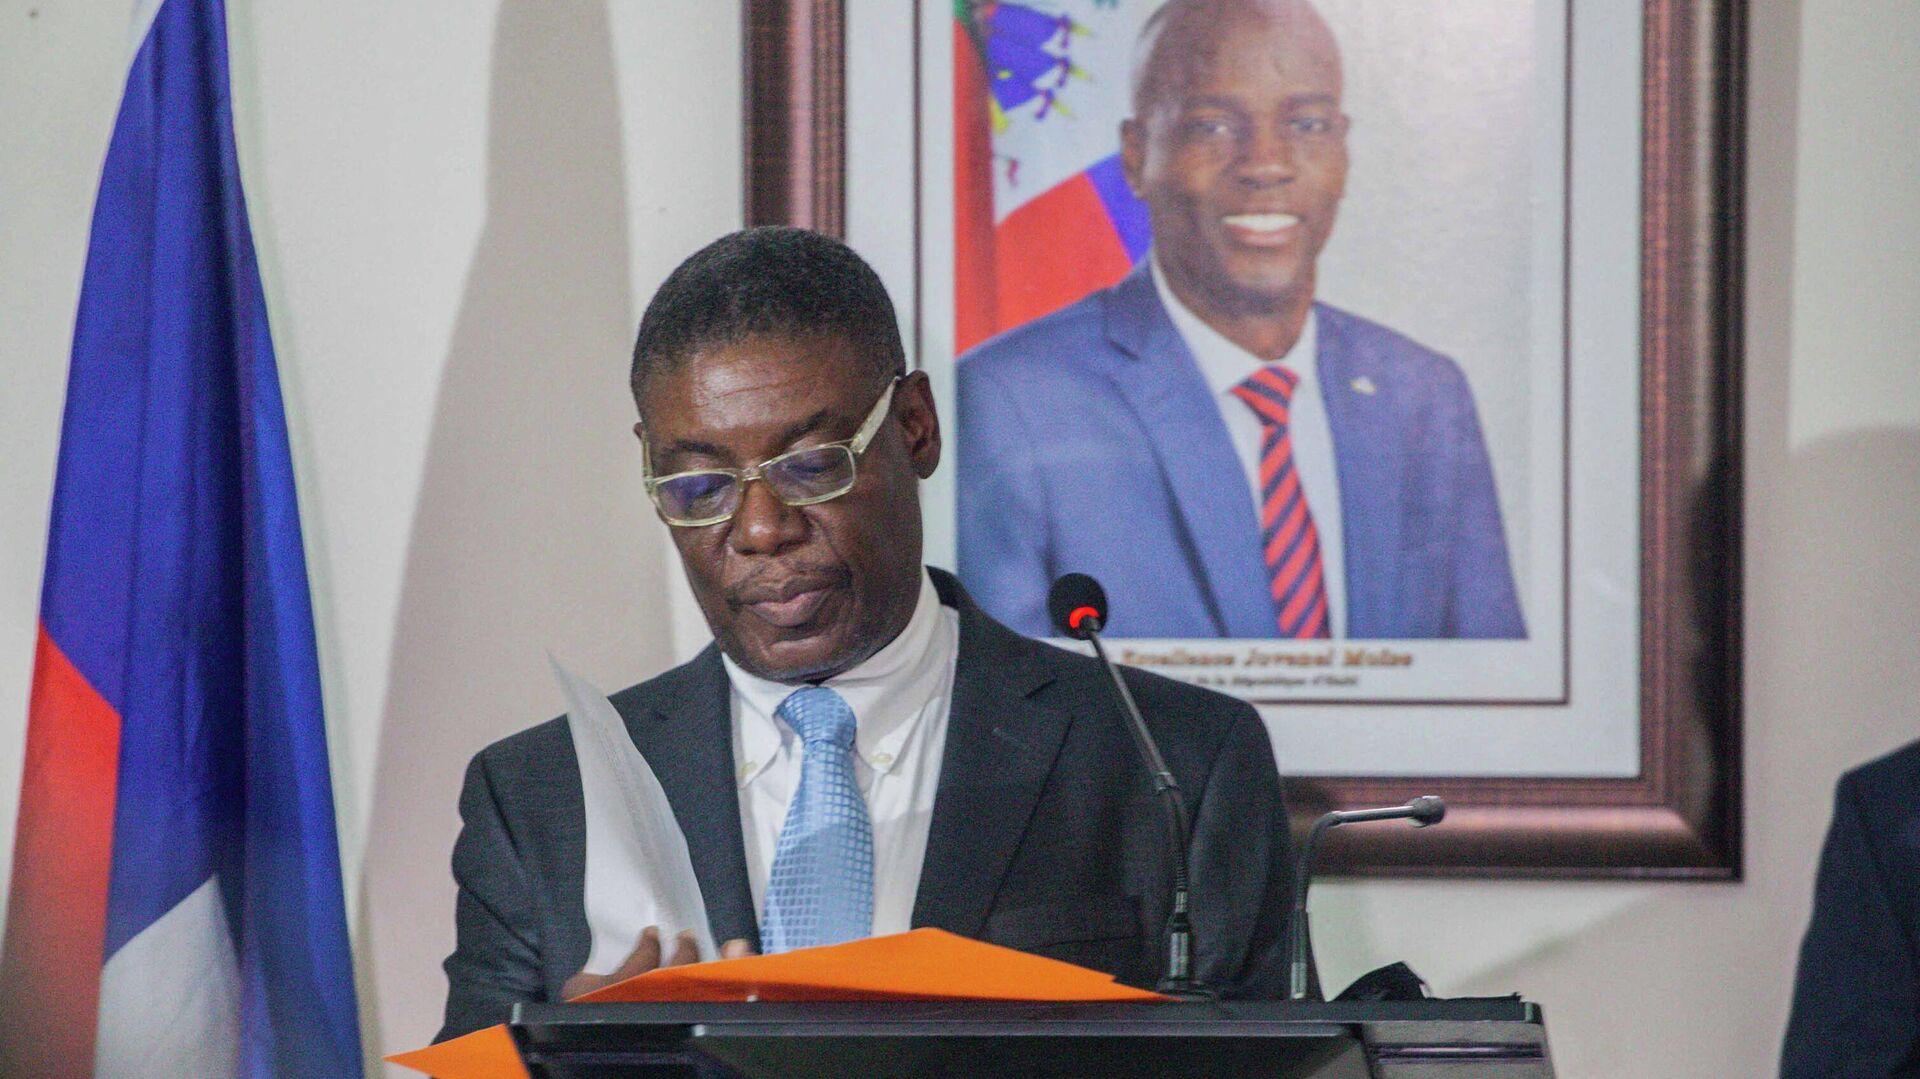 Ministro de Interior de Haití, Liszt Quitel - Sputnik Mundo, 1920, 16.09.2021